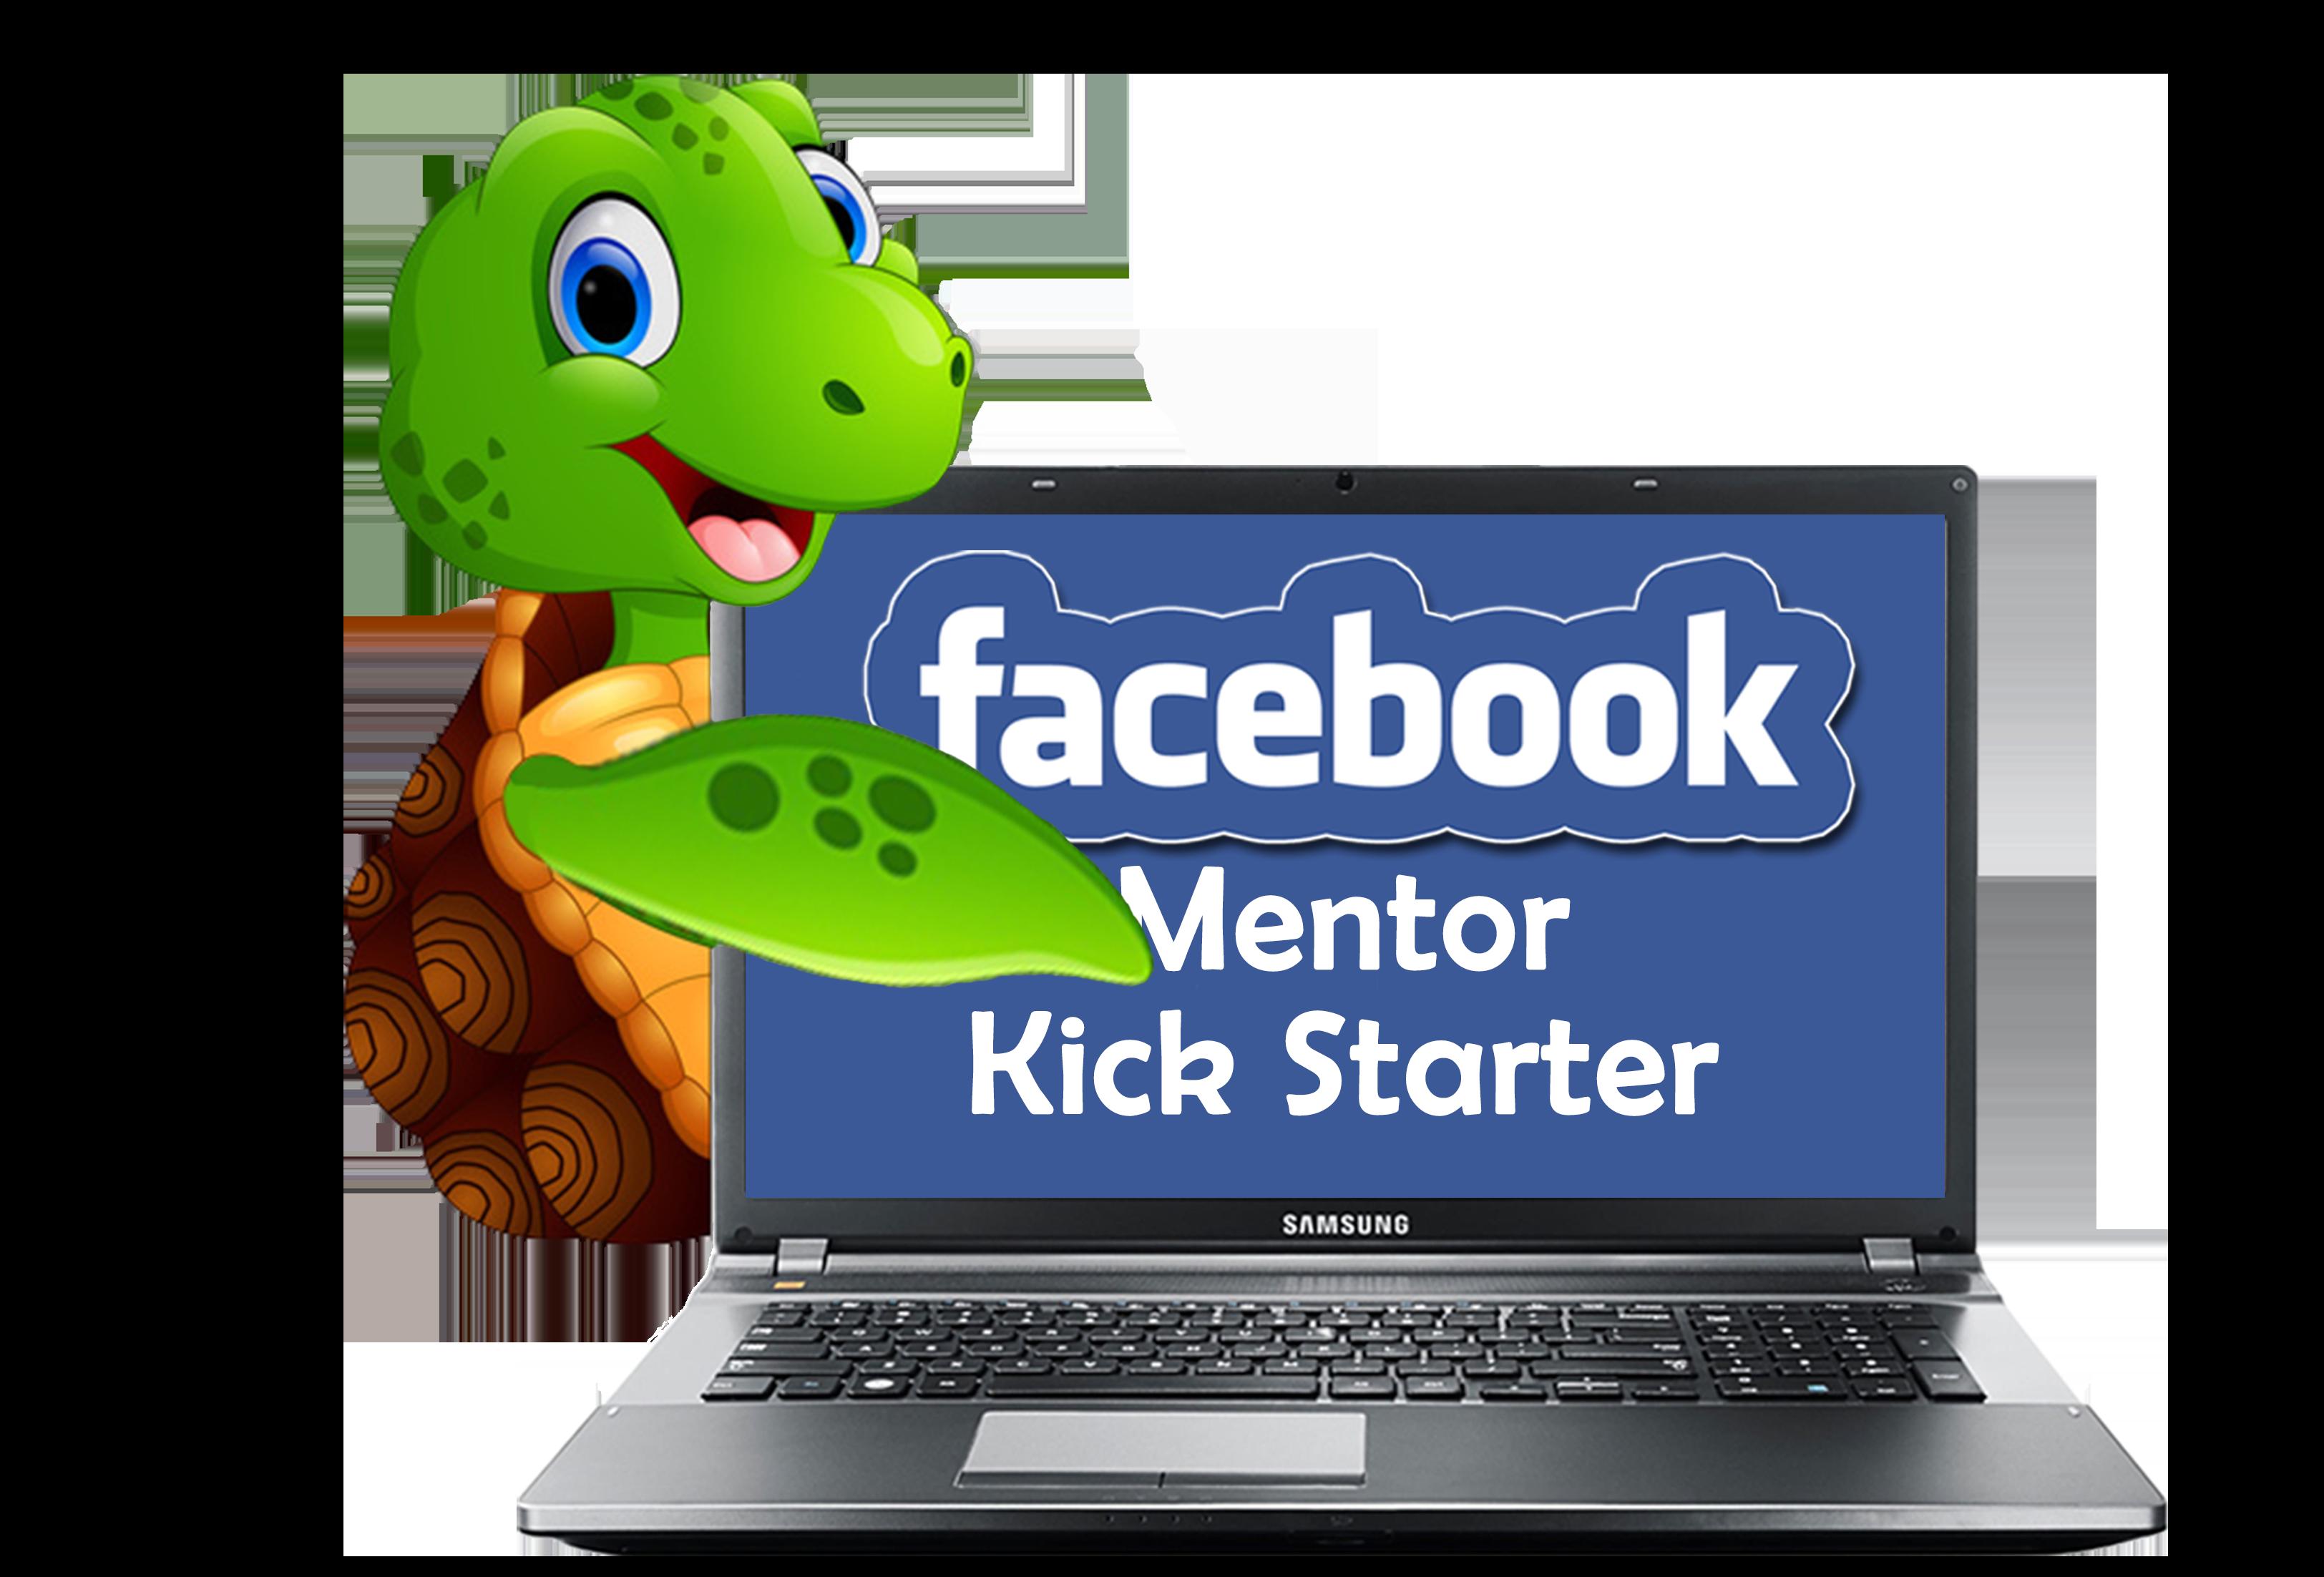 Facebook Mentor Kick Starter